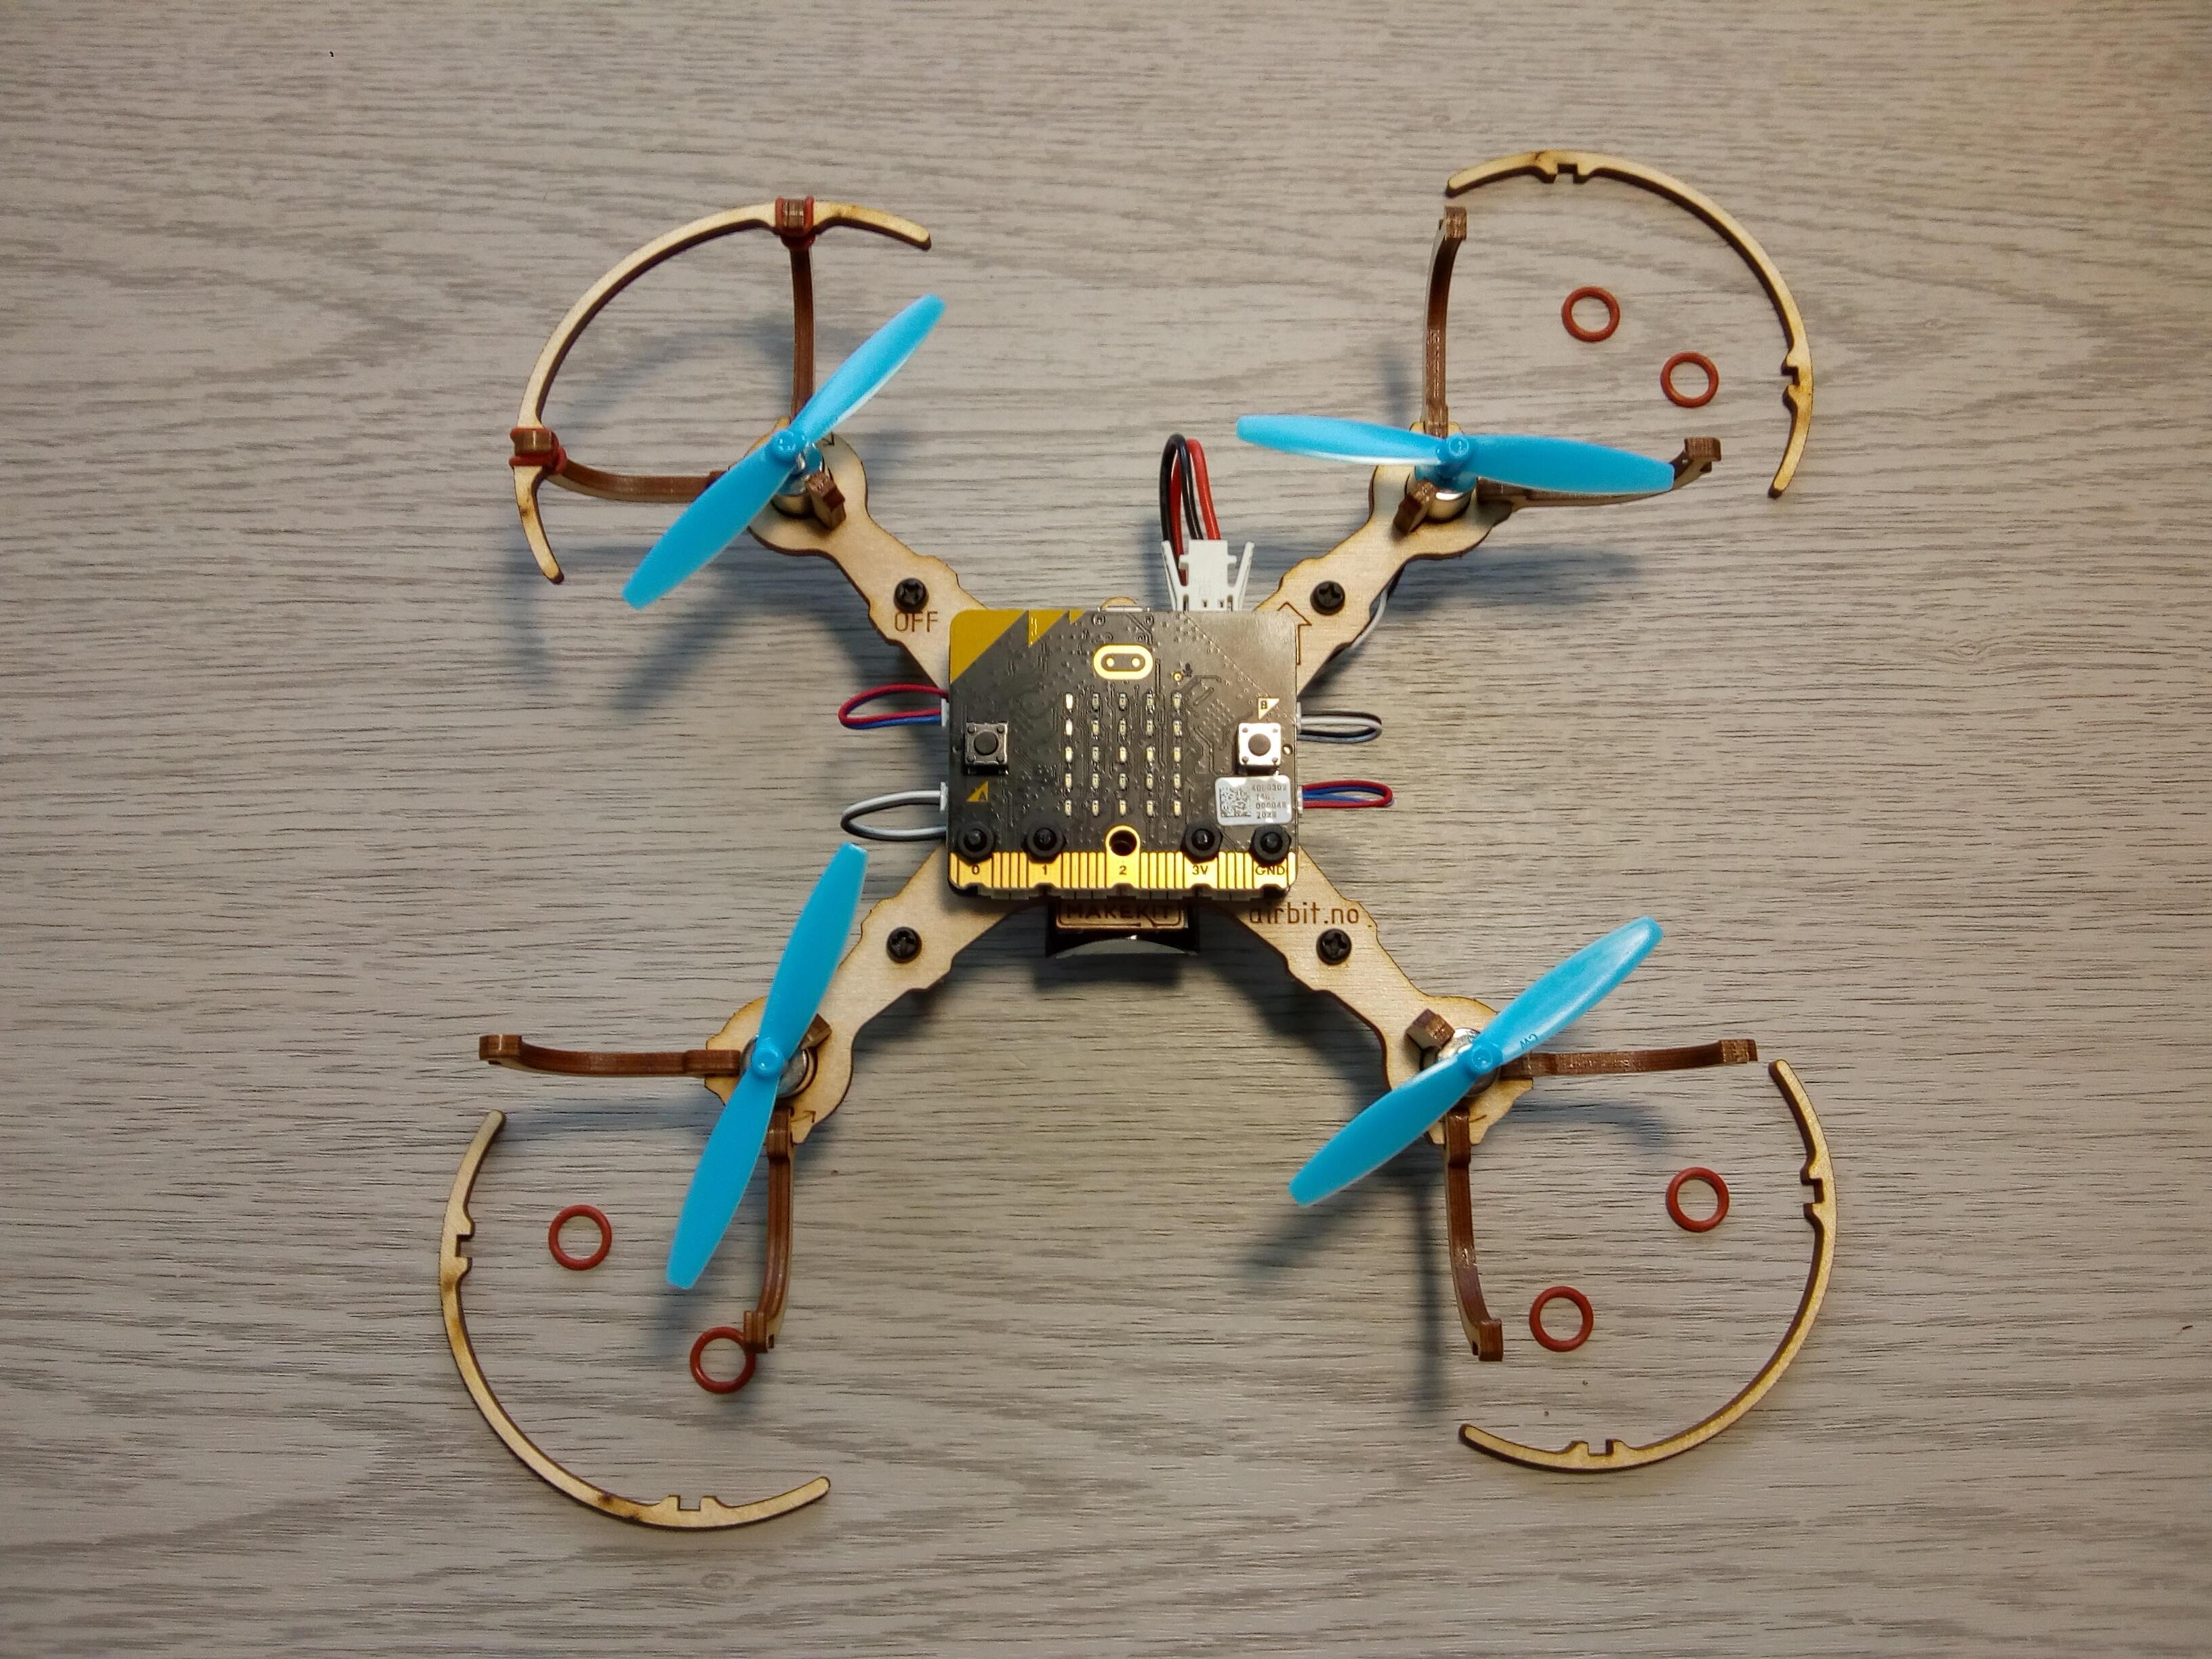 air:bit rotors